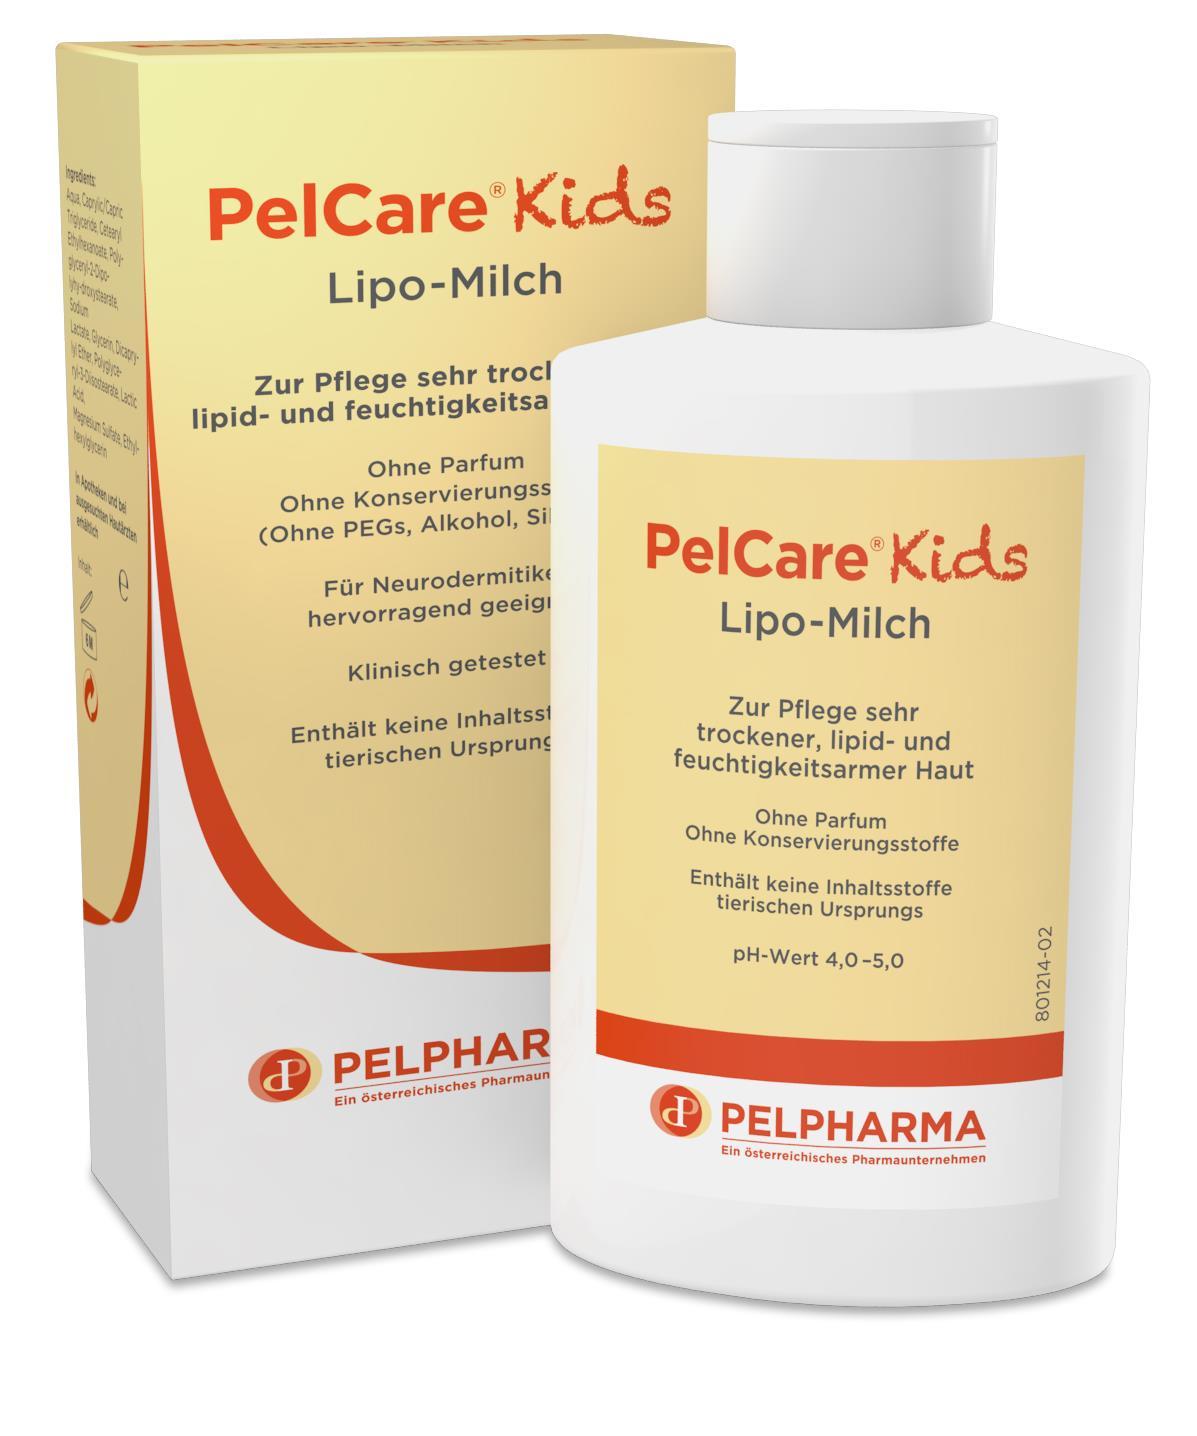 PelCare Kids